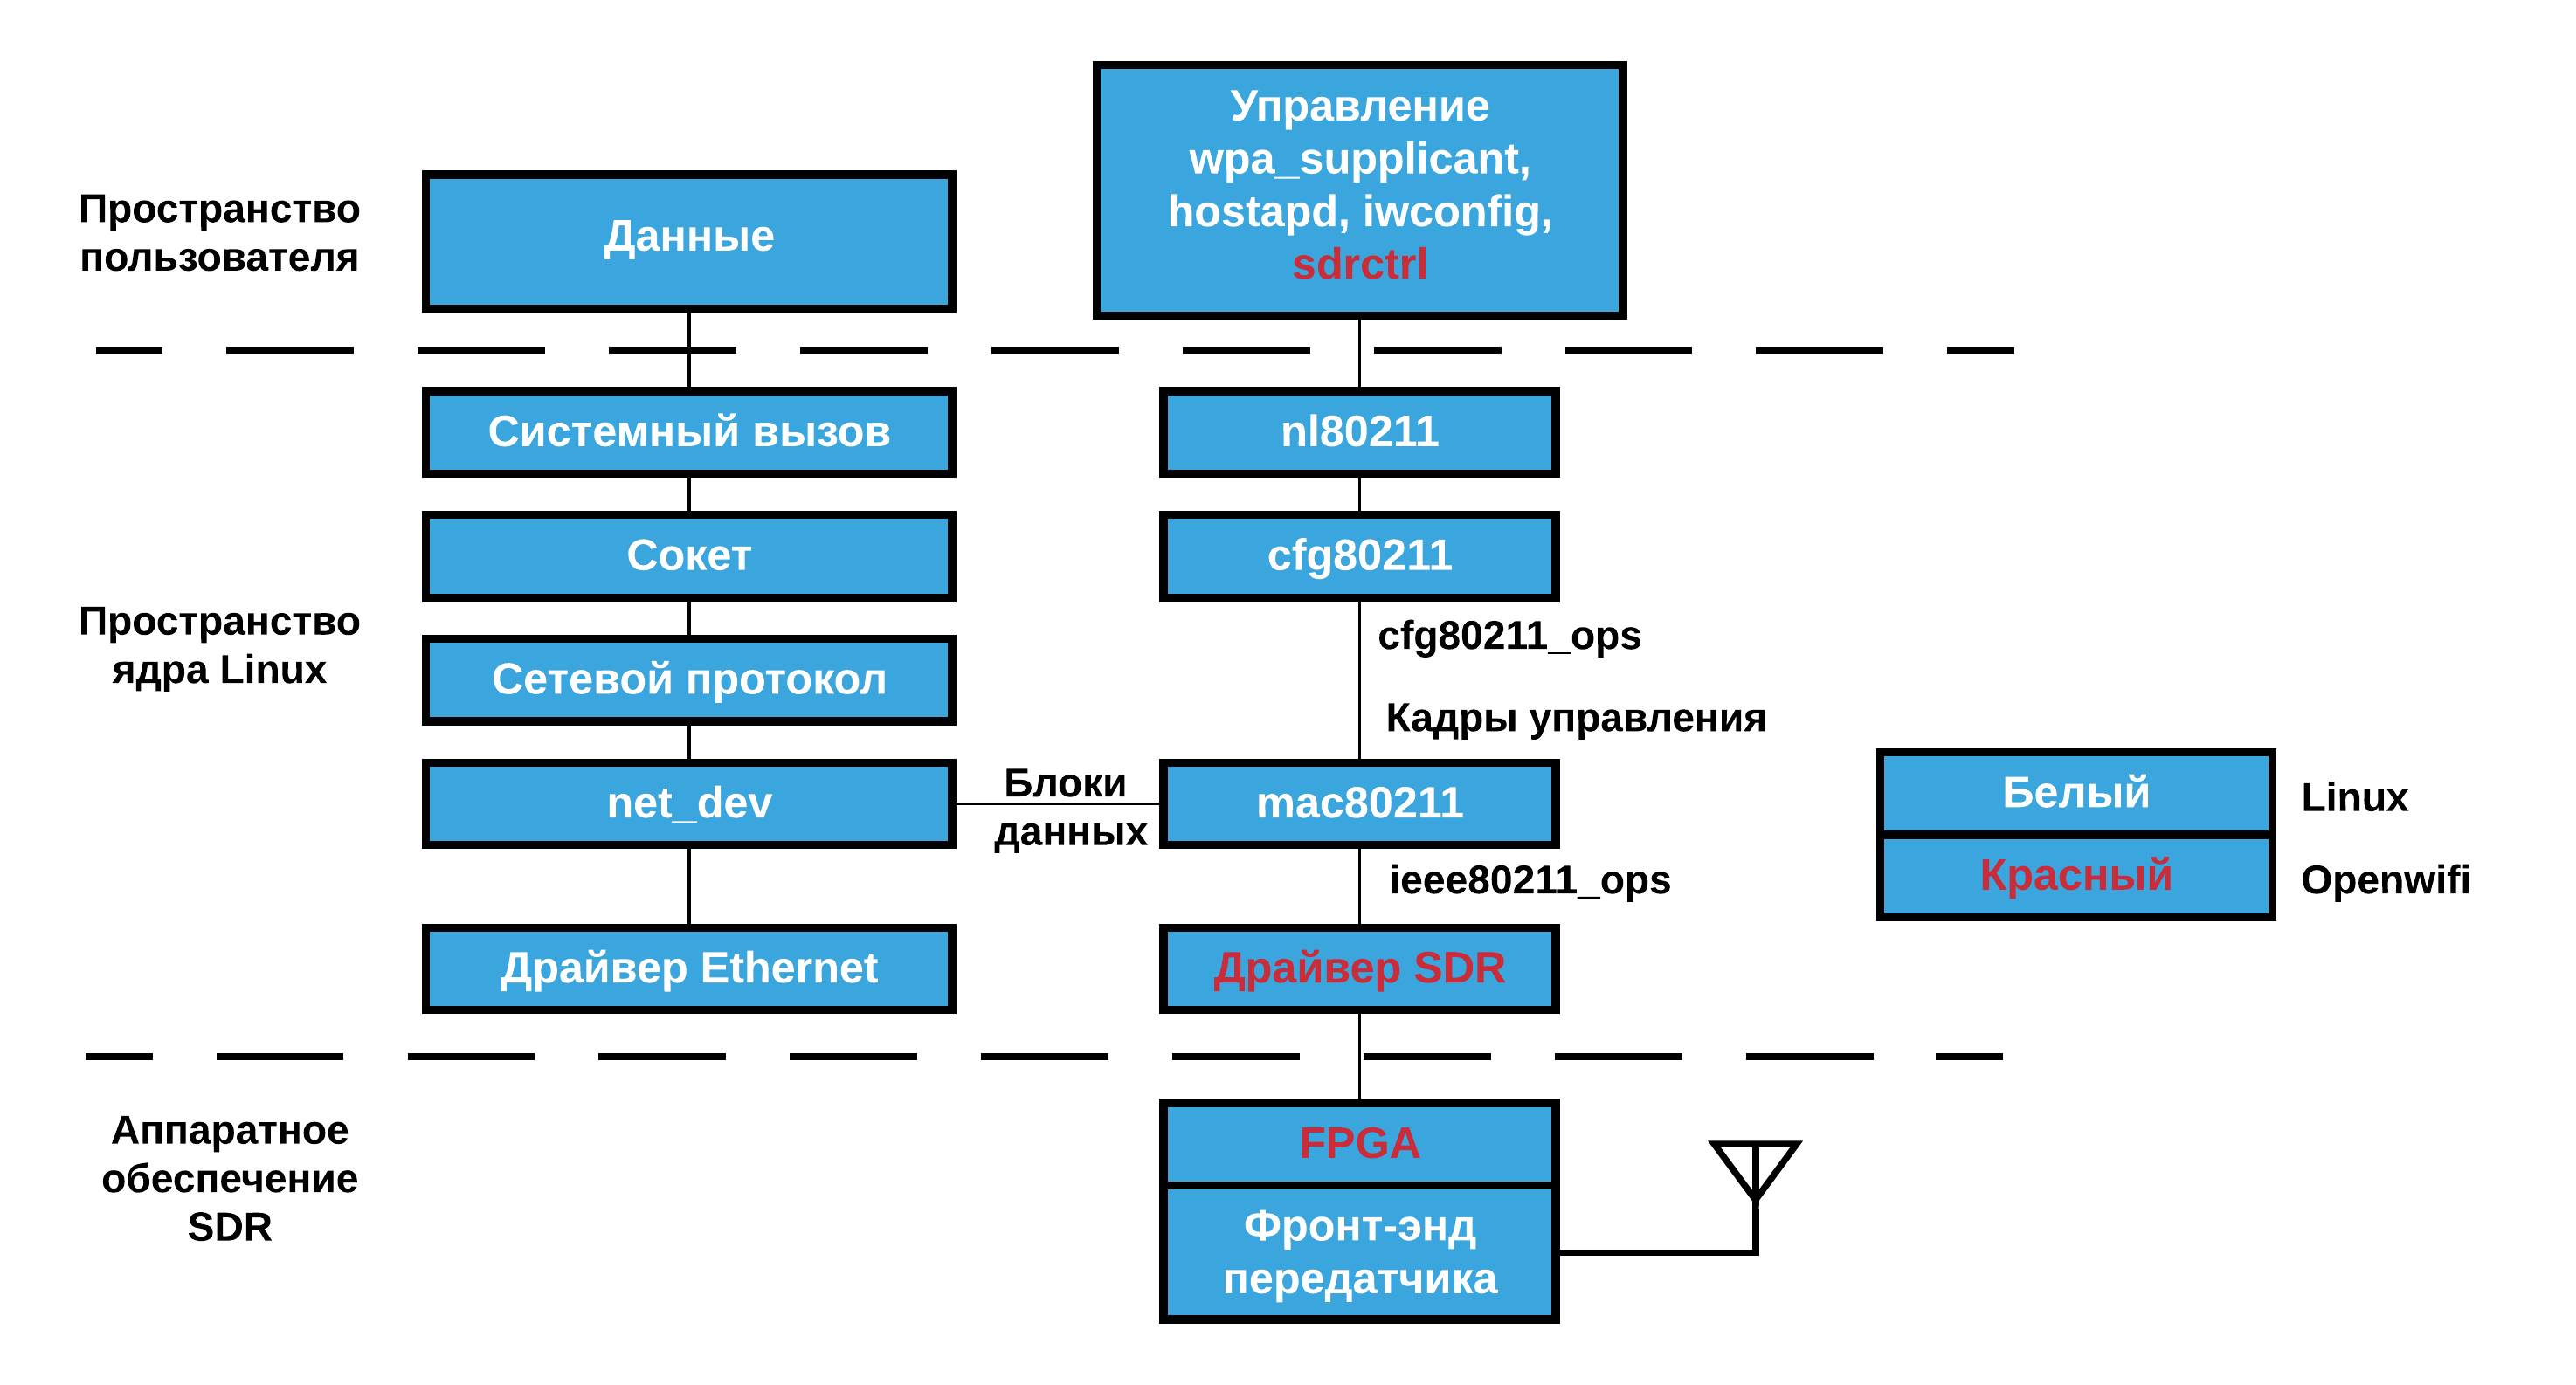 Проект Openwifi — как выглядит открытый Wi-Fi-чип - 2